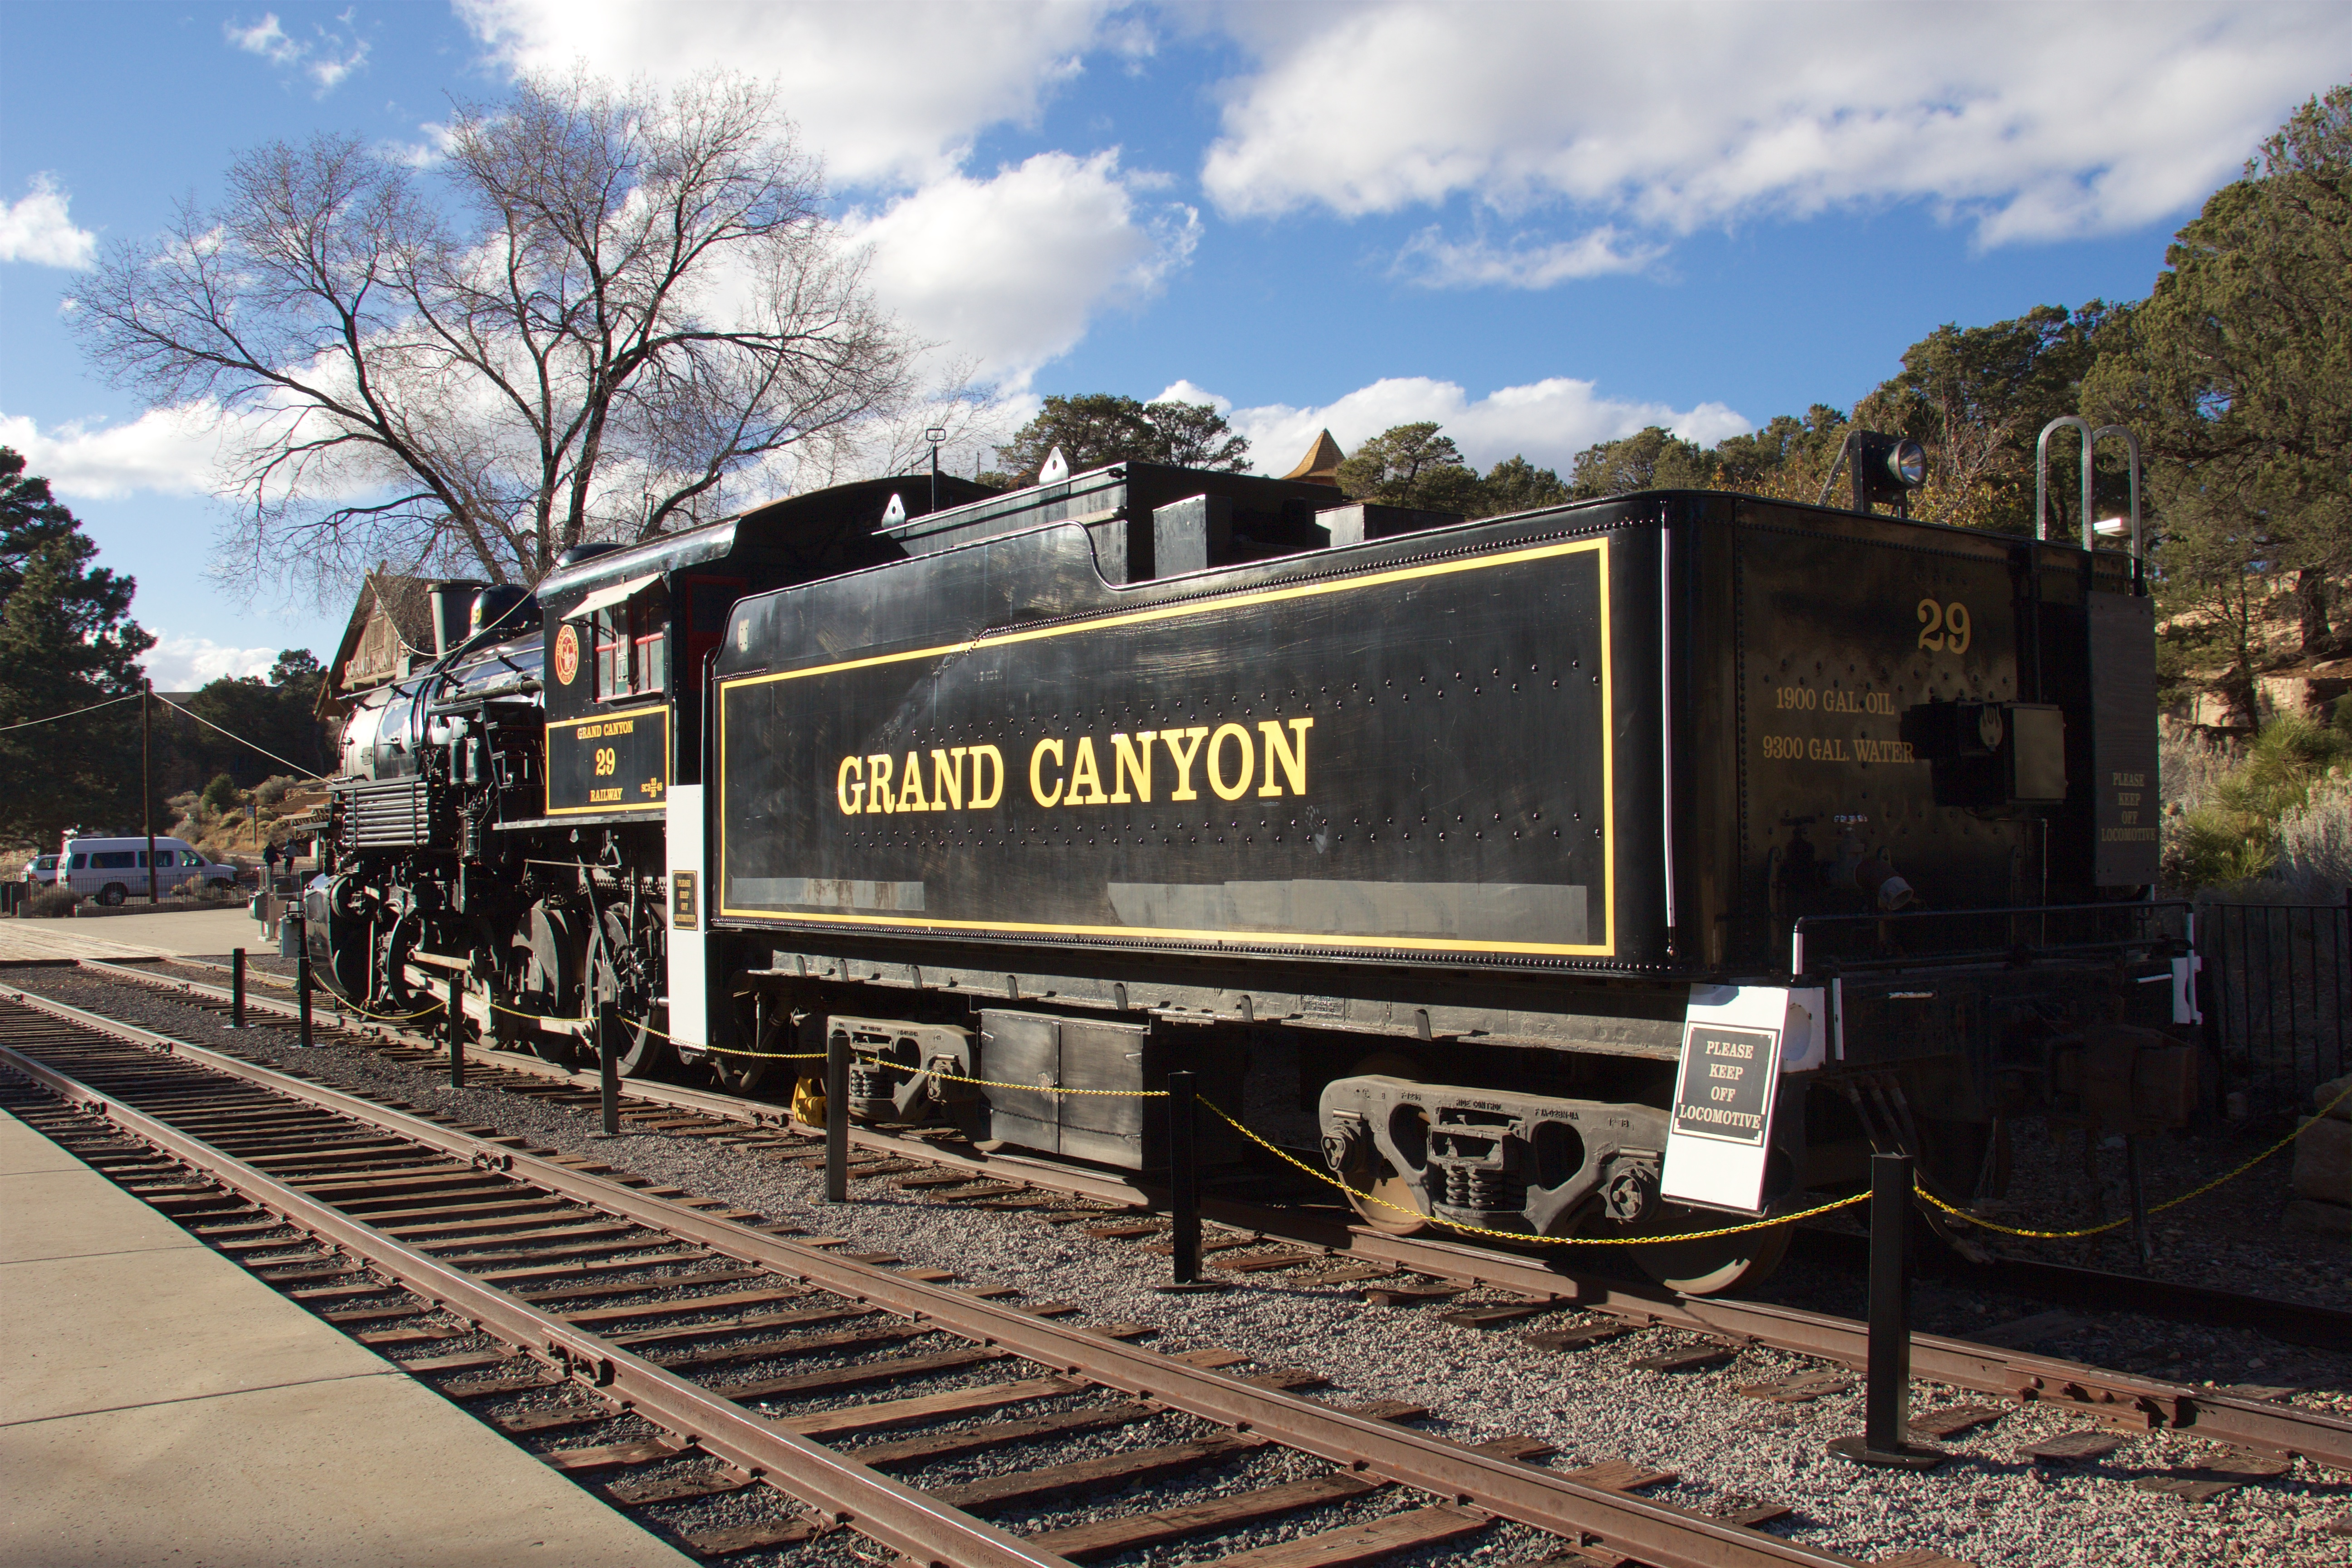 Grand Canyon Railroad Tours Review